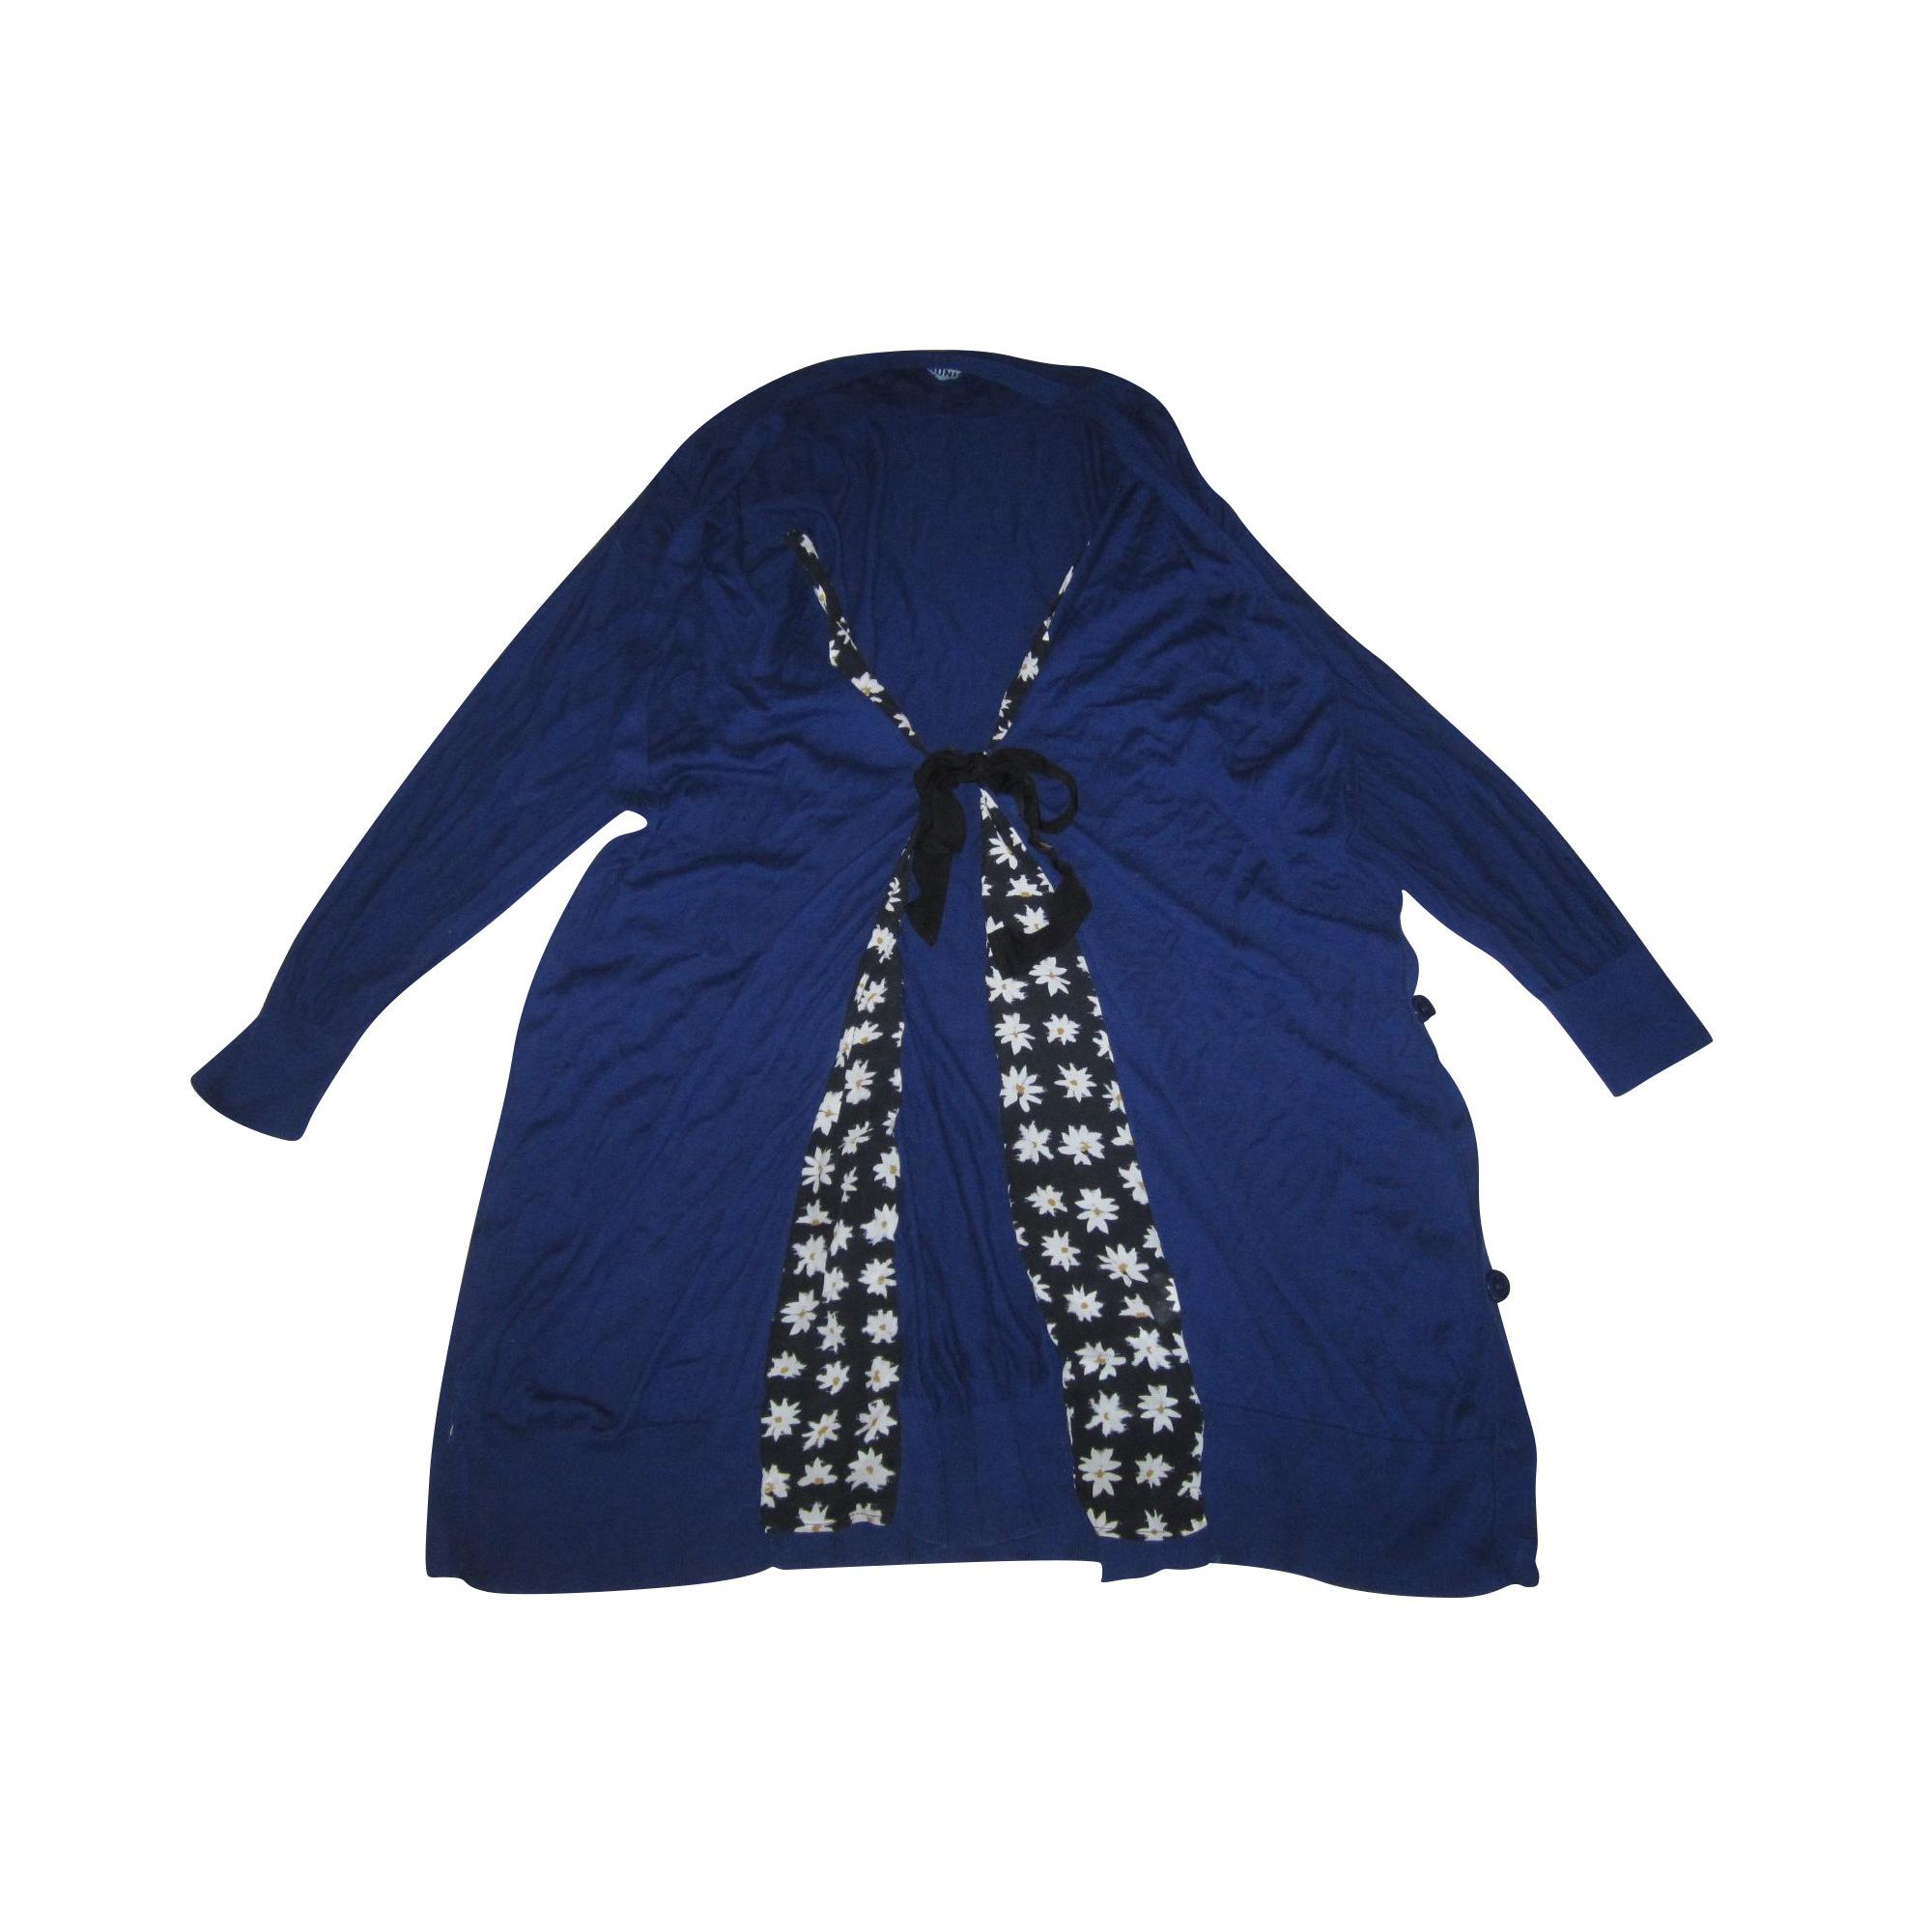 Sweater Dress SONIA RYKIEL Blue, navy, turquoise